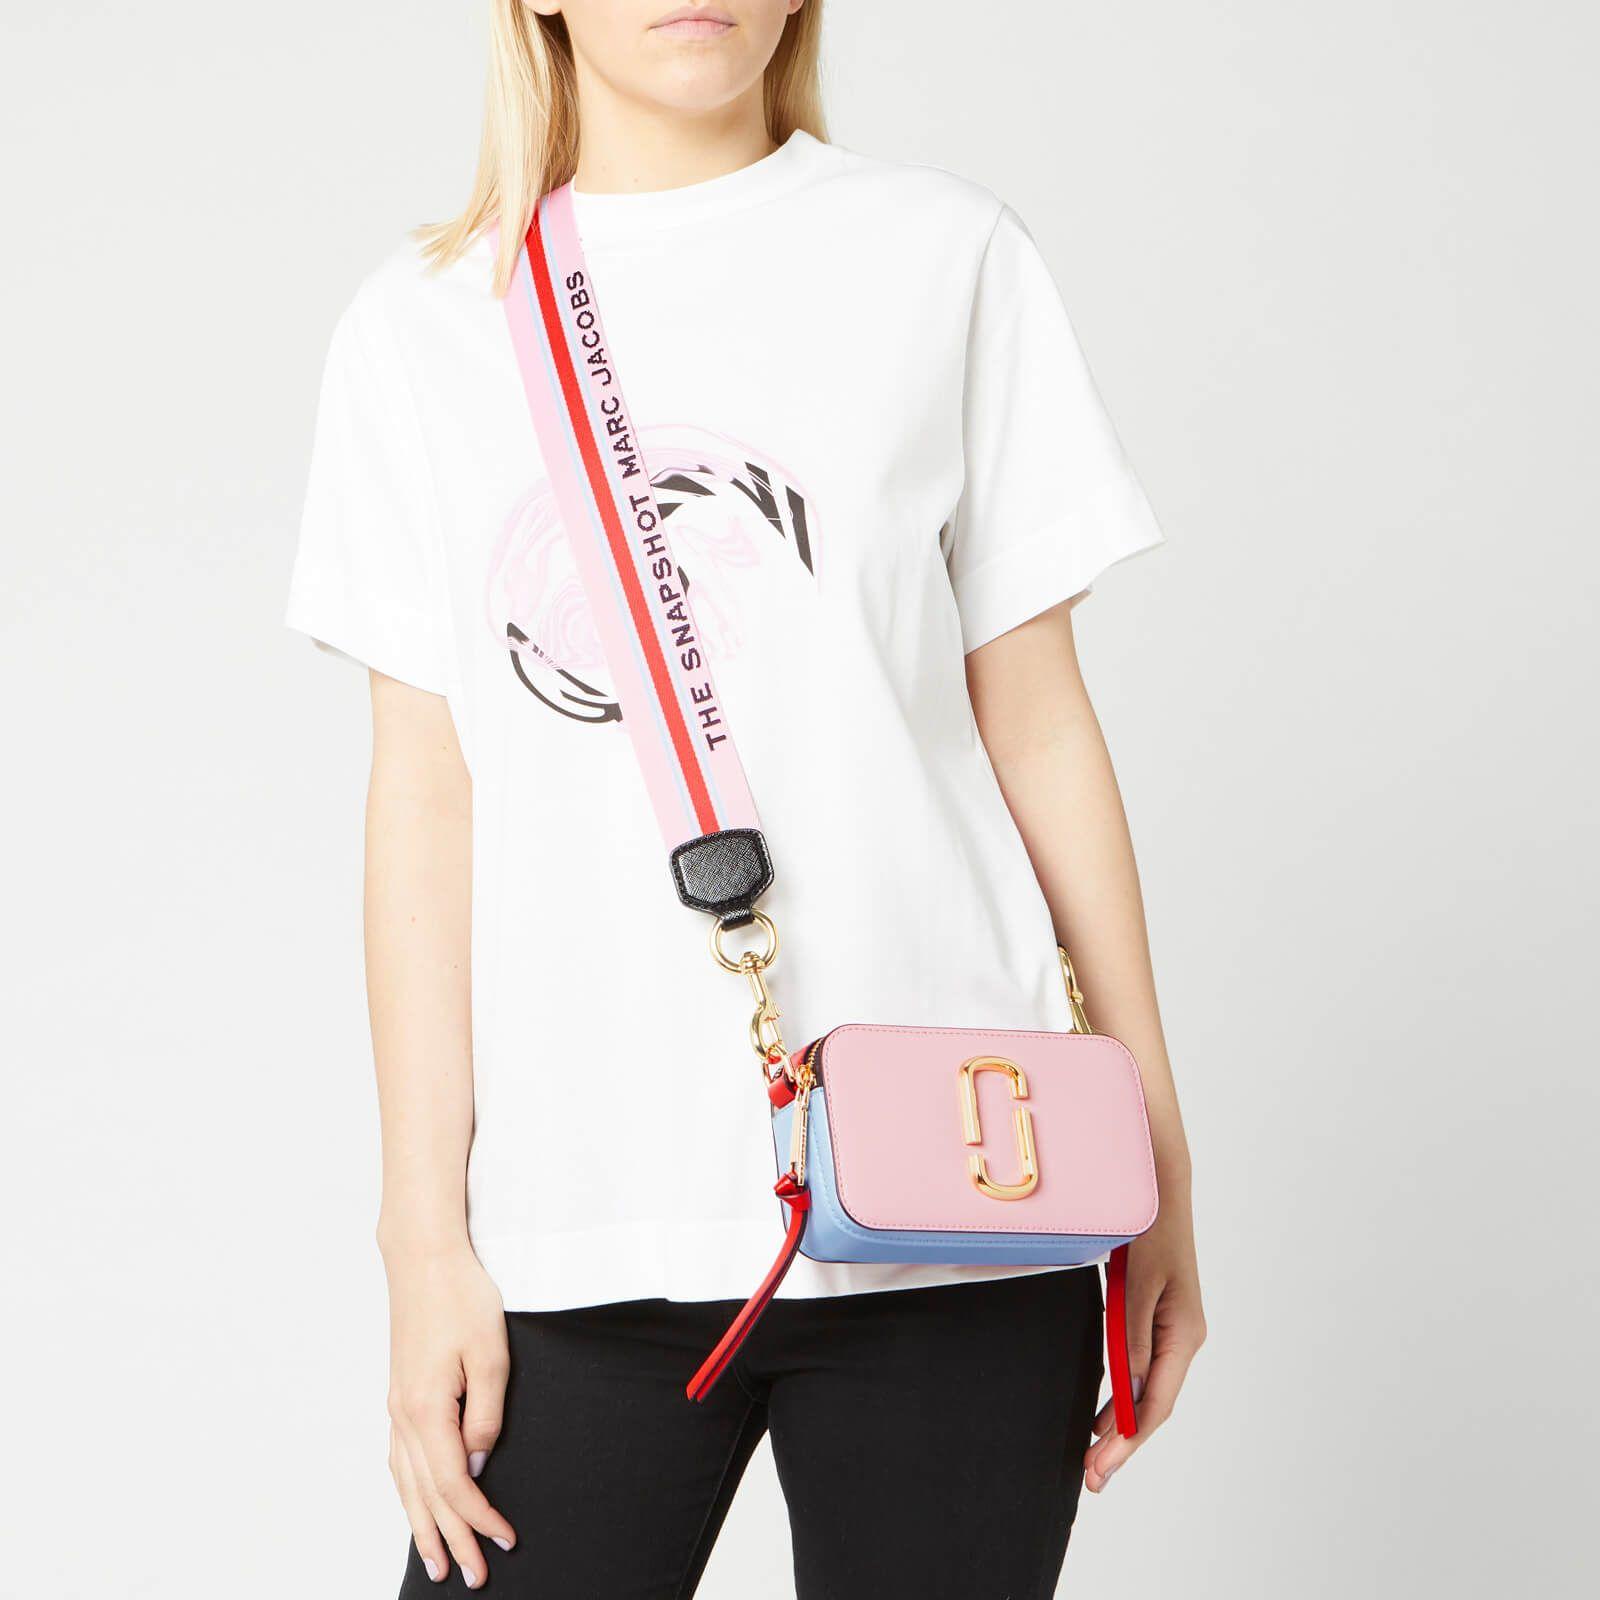 marc by marc jacobs väska rosa